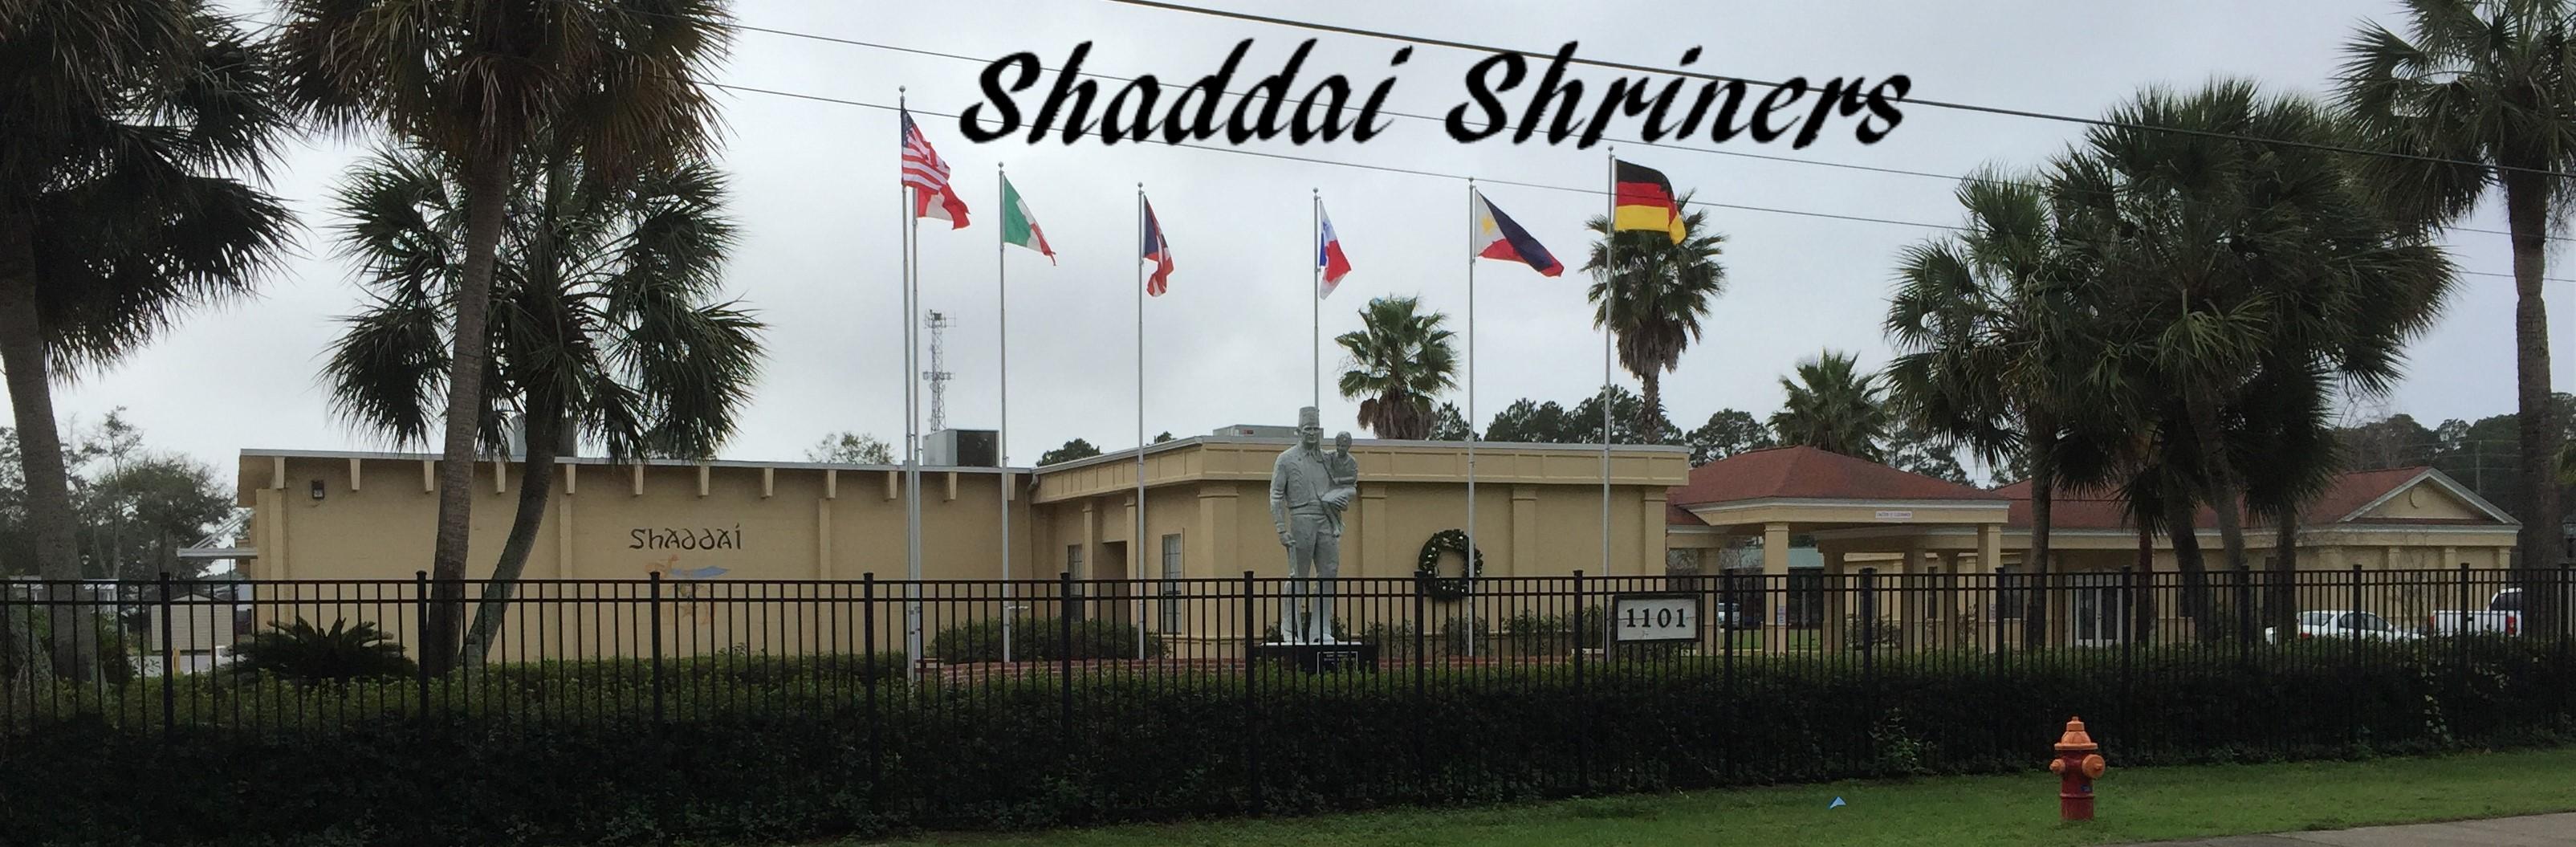 Shaddai Shriners